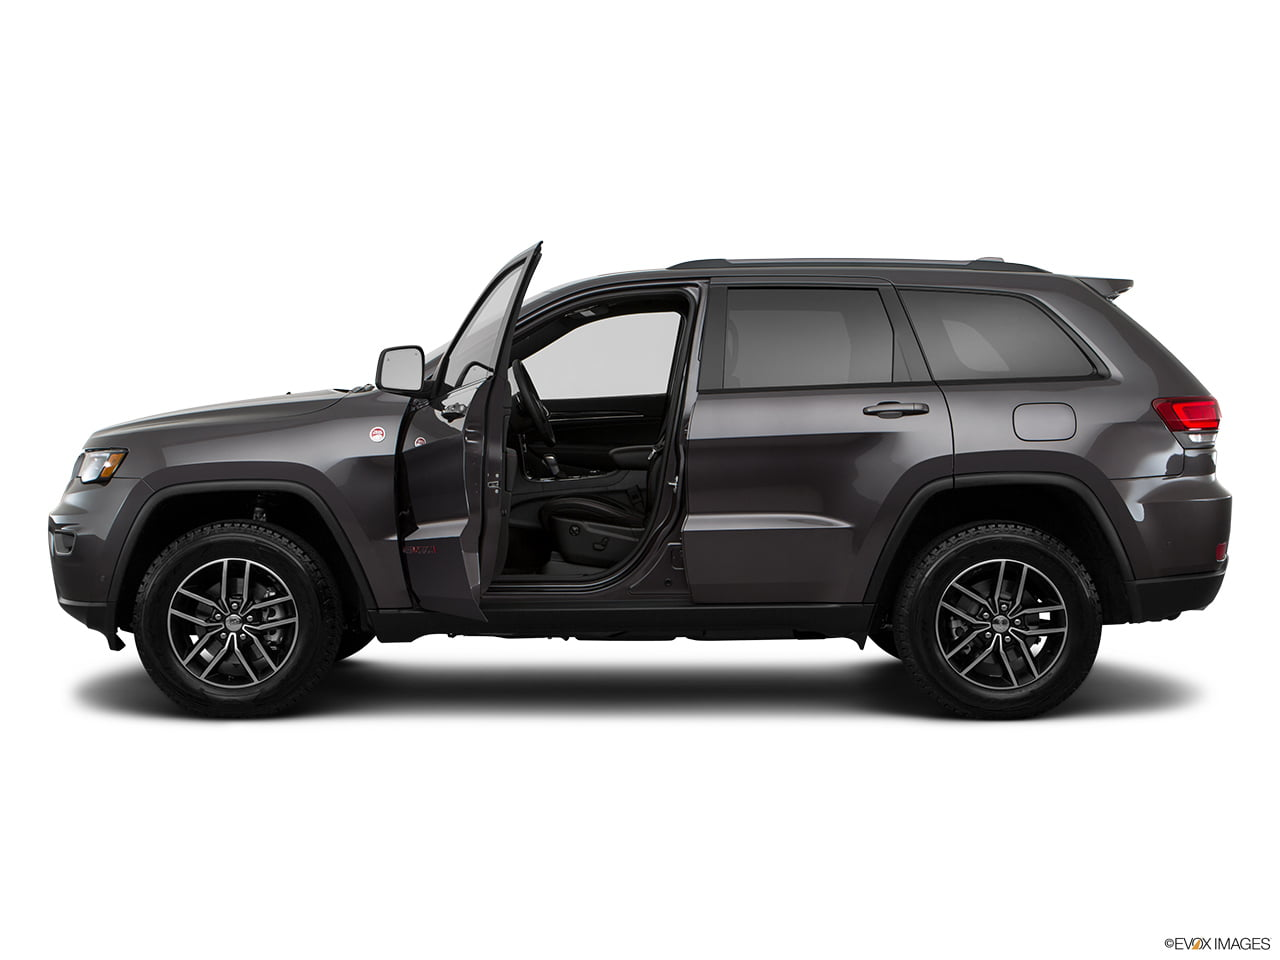 2020 Jeep Grand Cherokee SRT (Monthly Leasing Deals ...